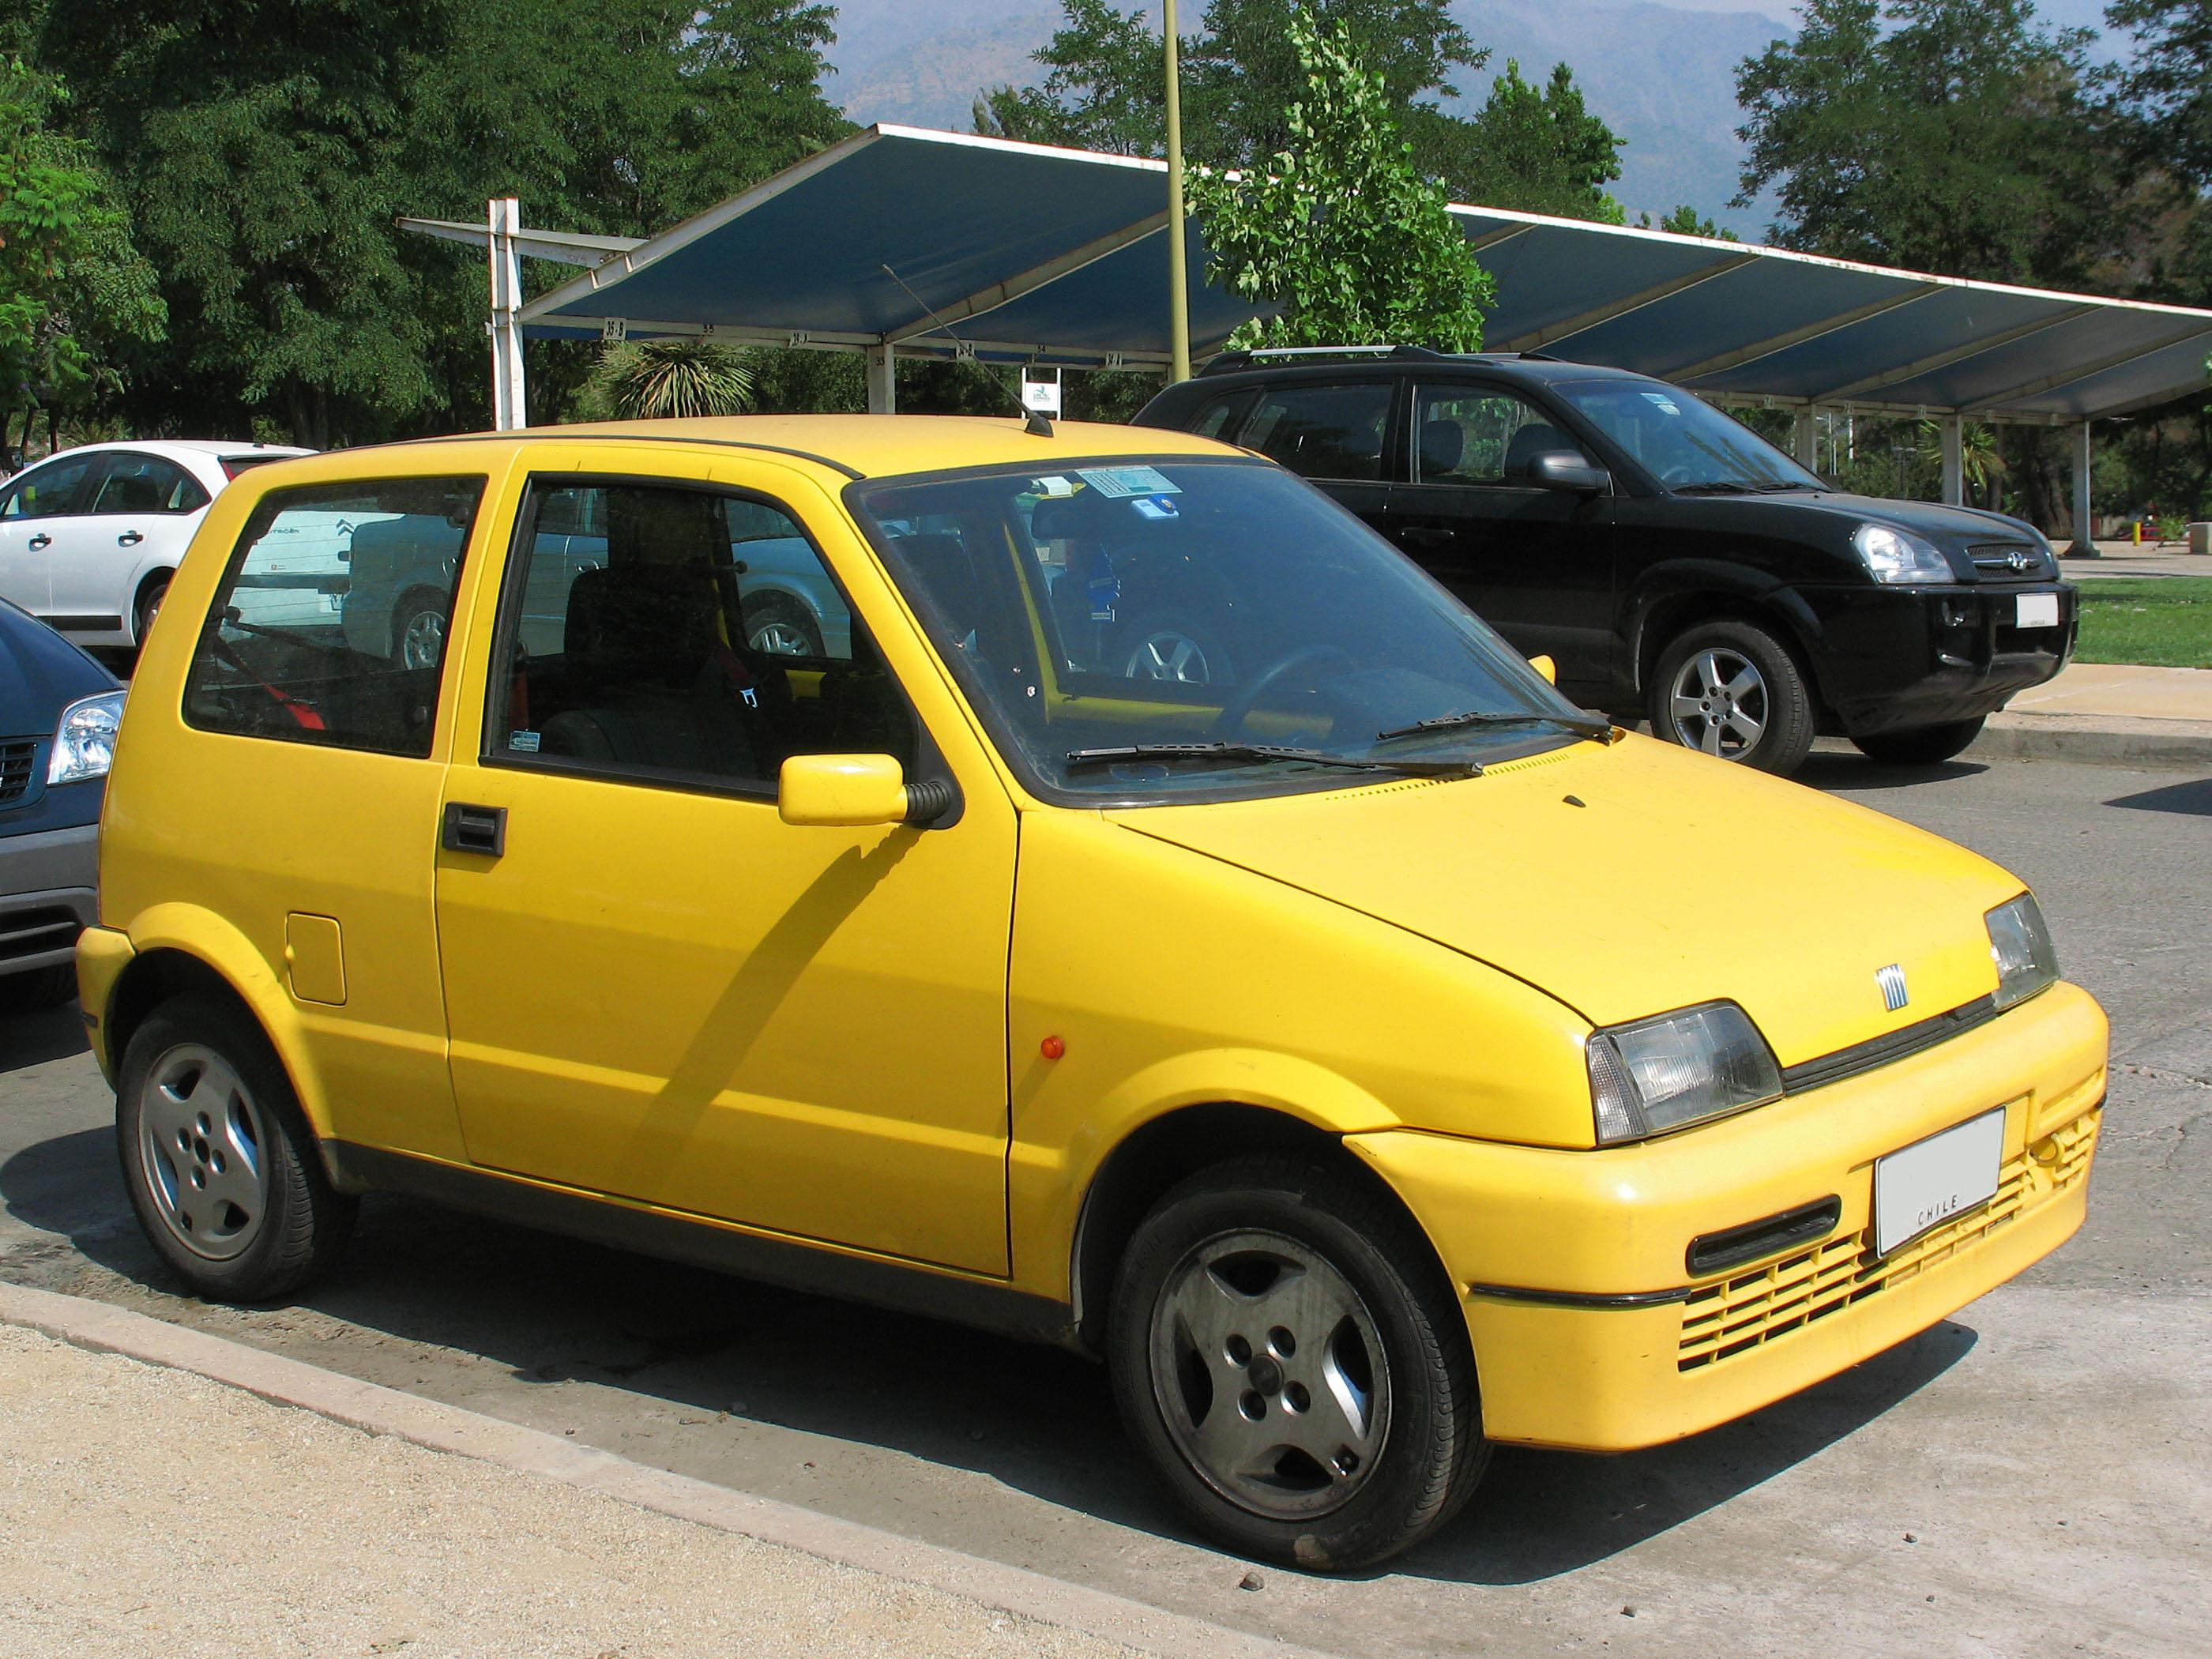 File Fiat Cinquecento 1 1 Sporting 1997 12469062075 Jpg